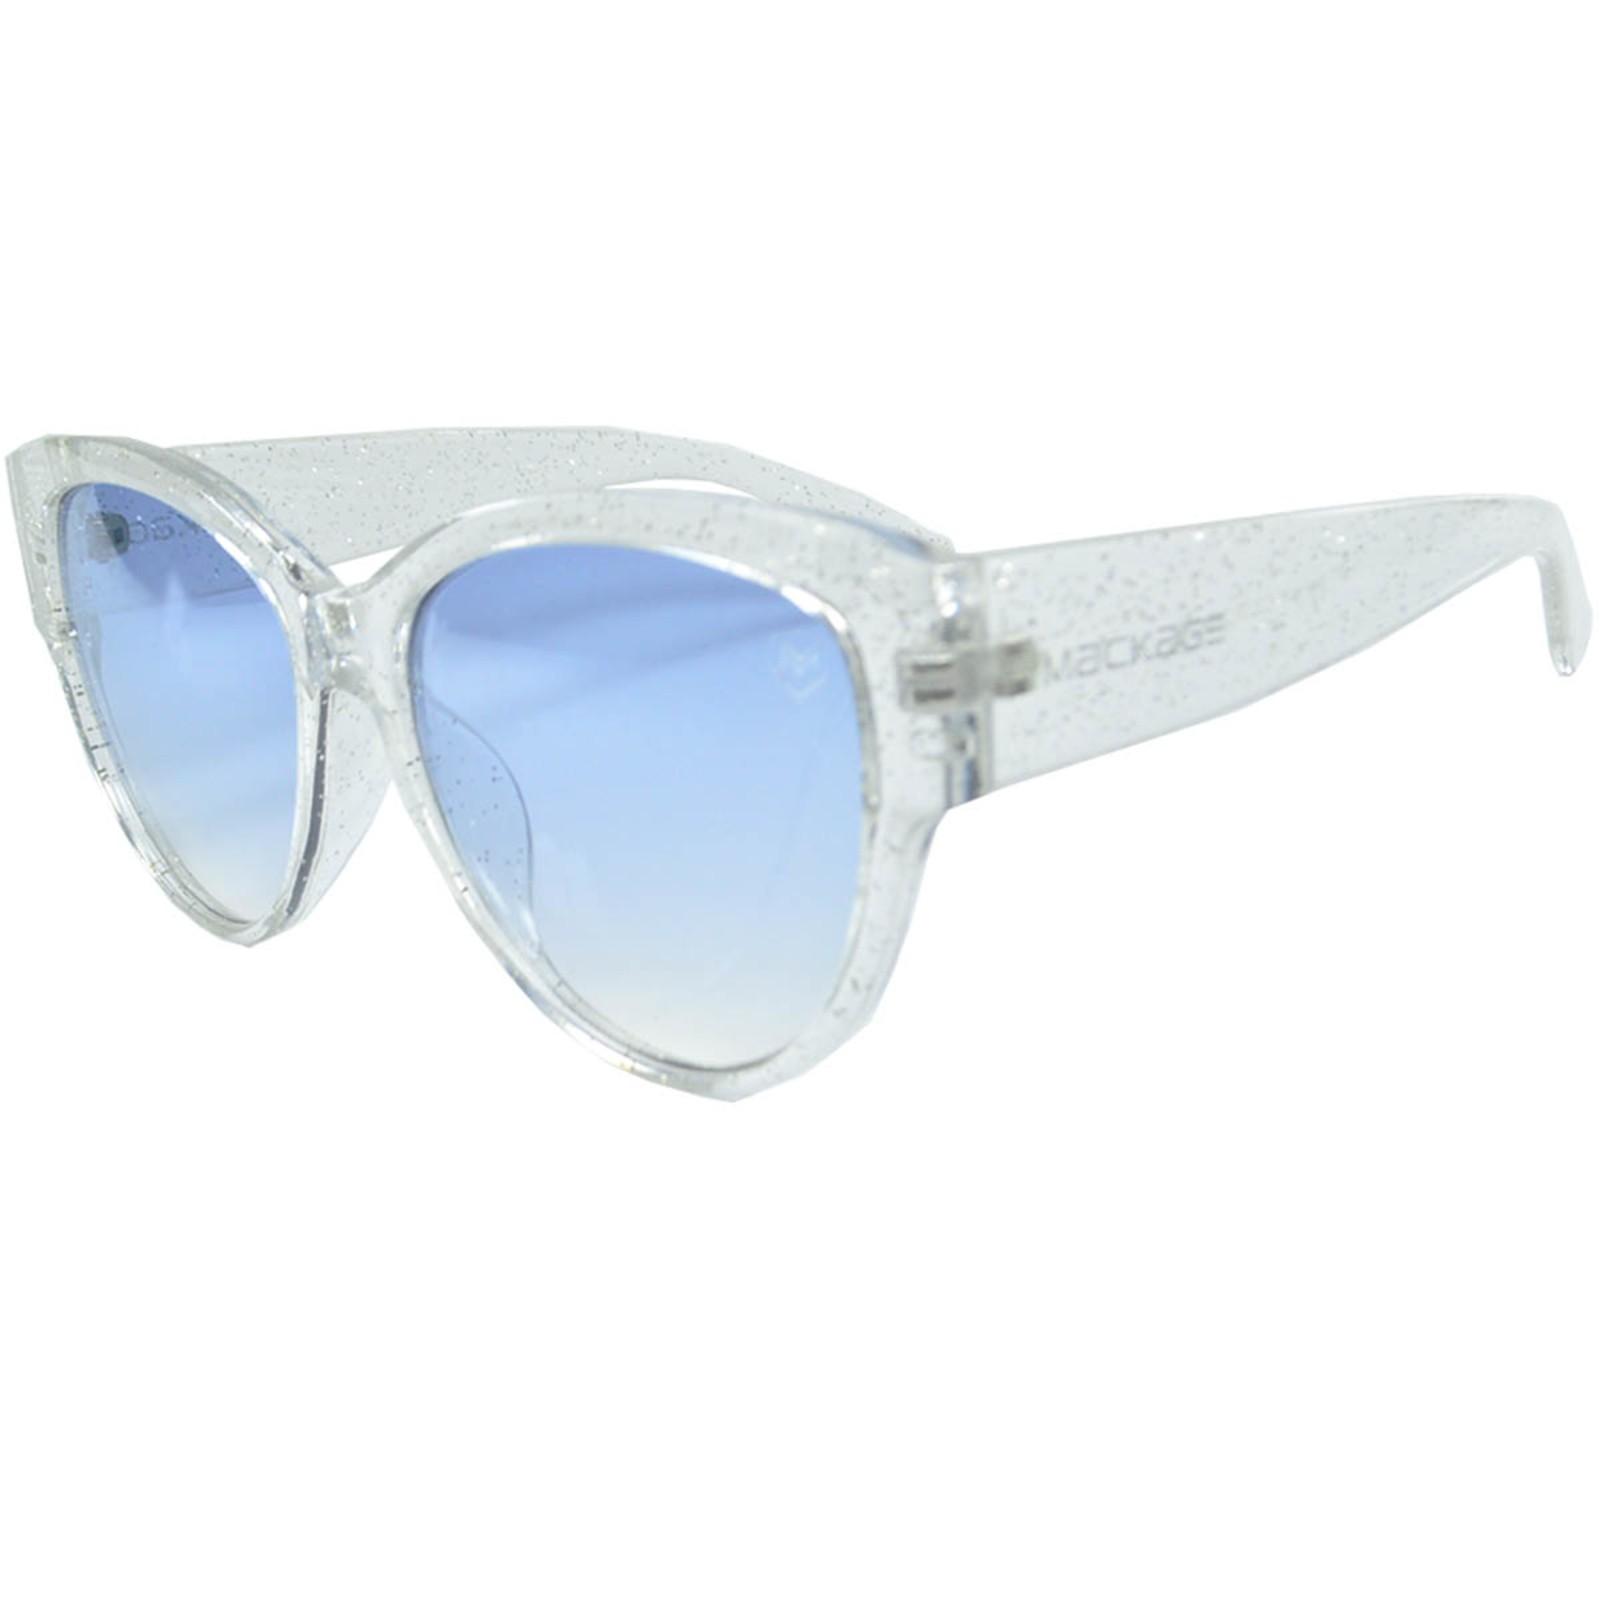 Óculos De Sol Mackage Feminino Acetato Redondo Jacko Feminino - Cristal